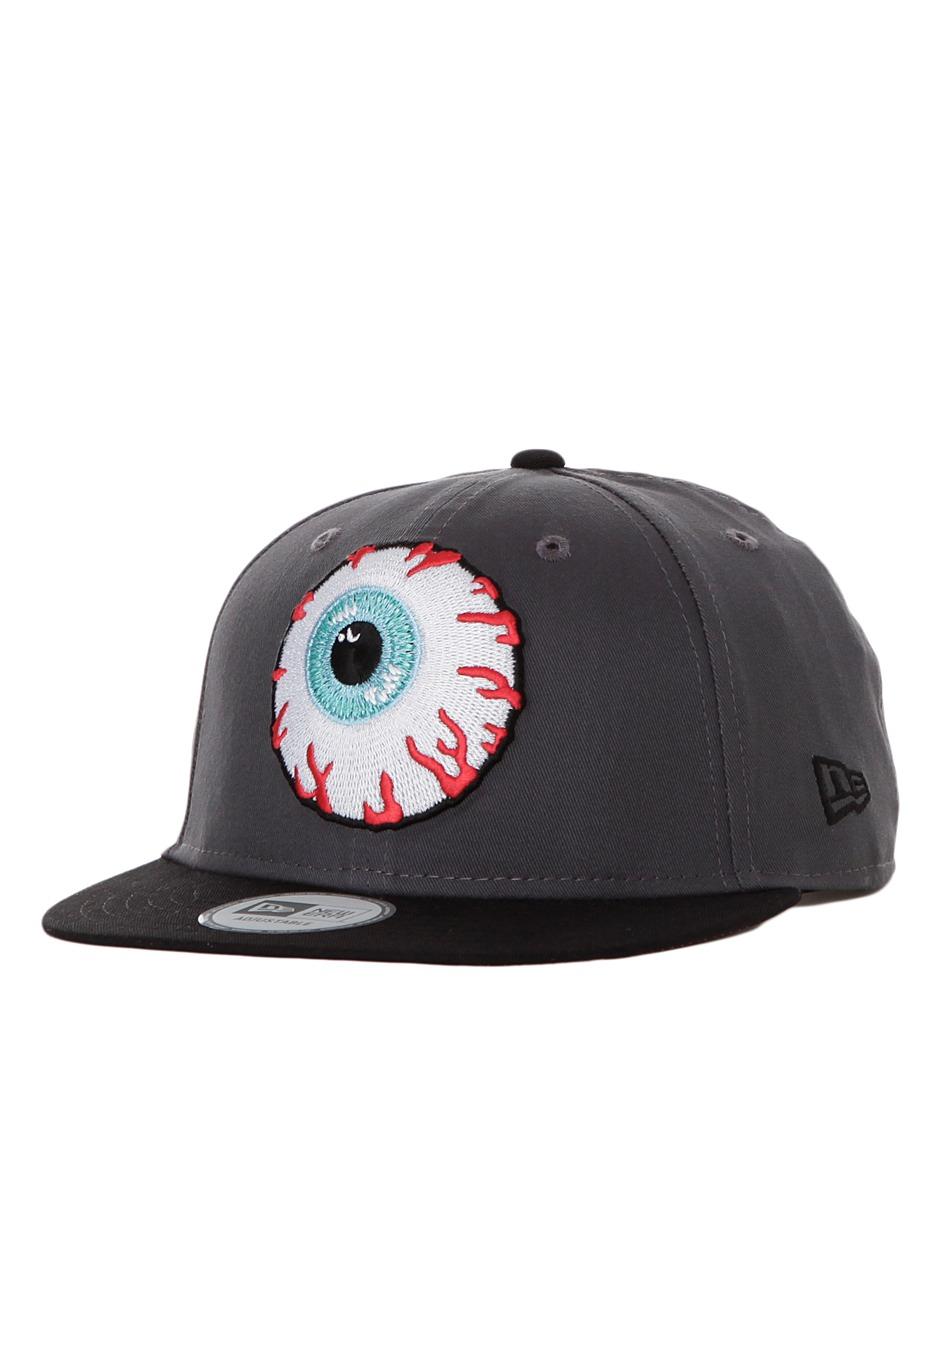 20be67e5296 Mishka - Keep Watch New Era Grey Black Snapback - Cap - Streetwear Shop -  Impericon.com UK